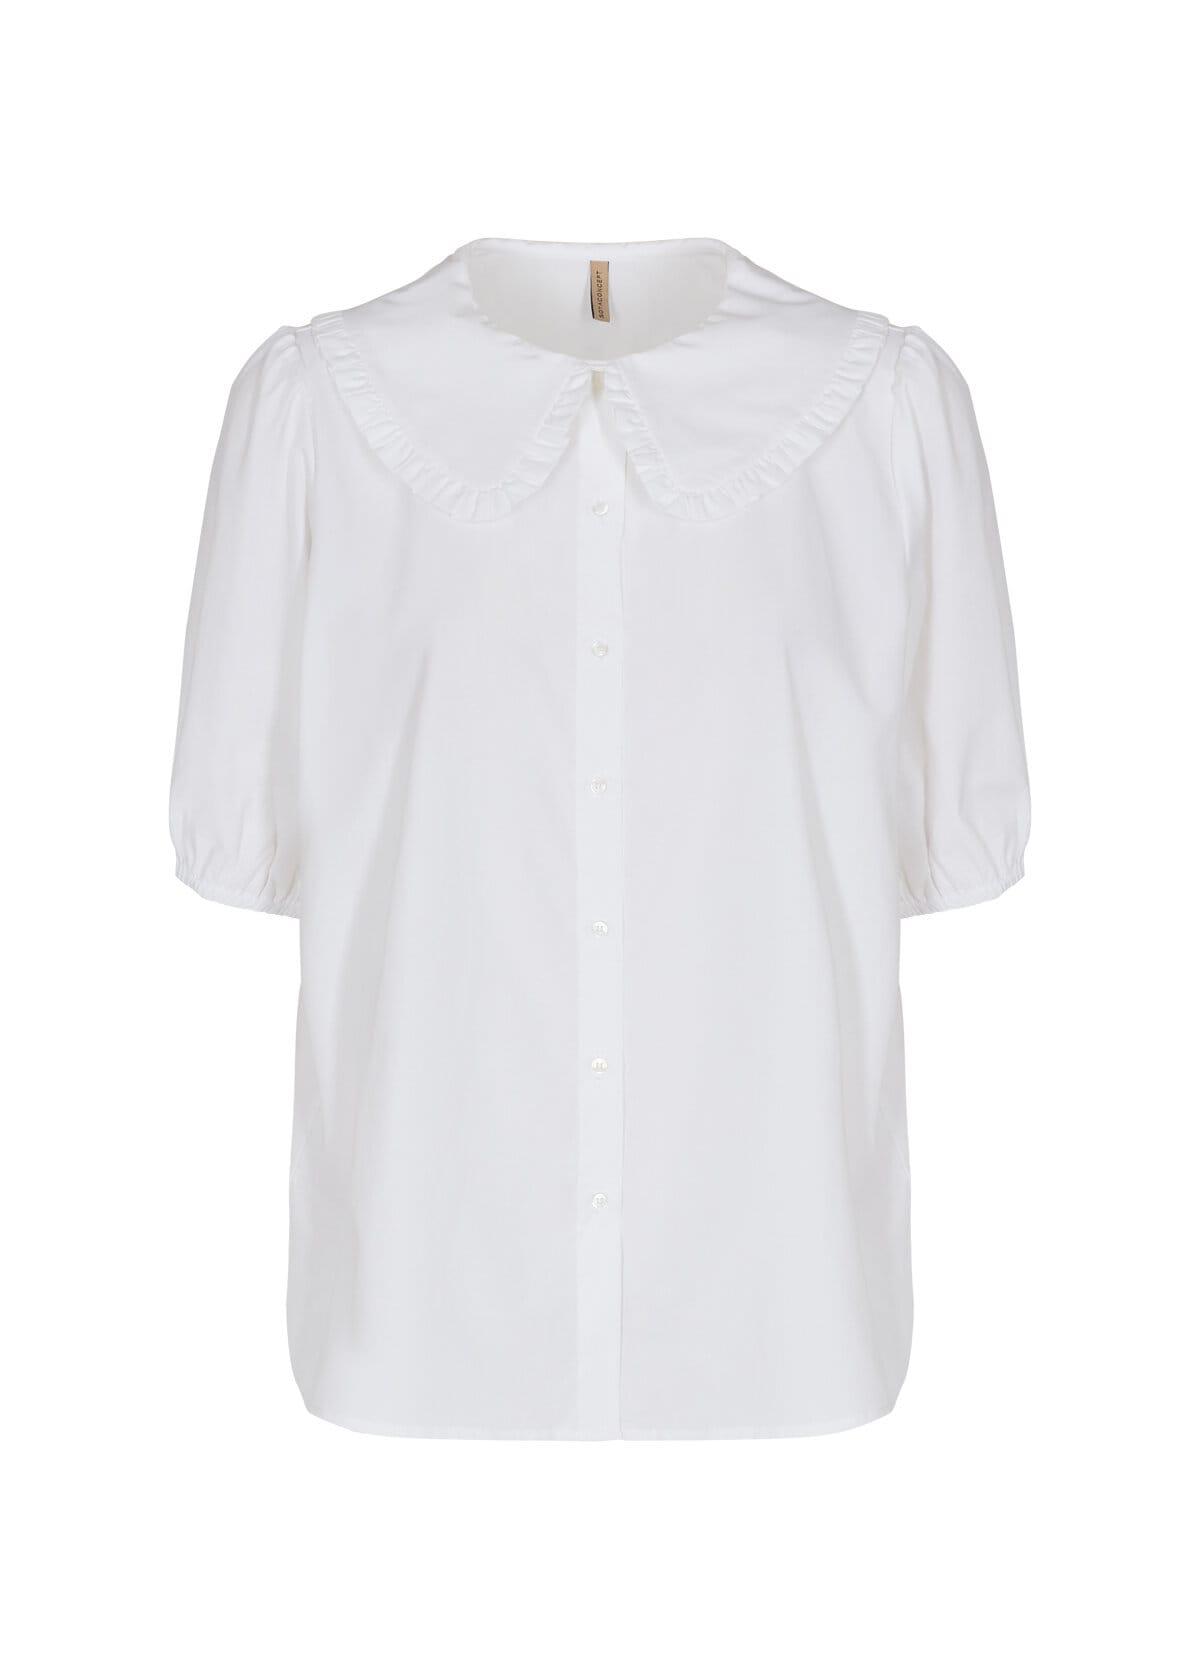 Netti 4 Blus - White